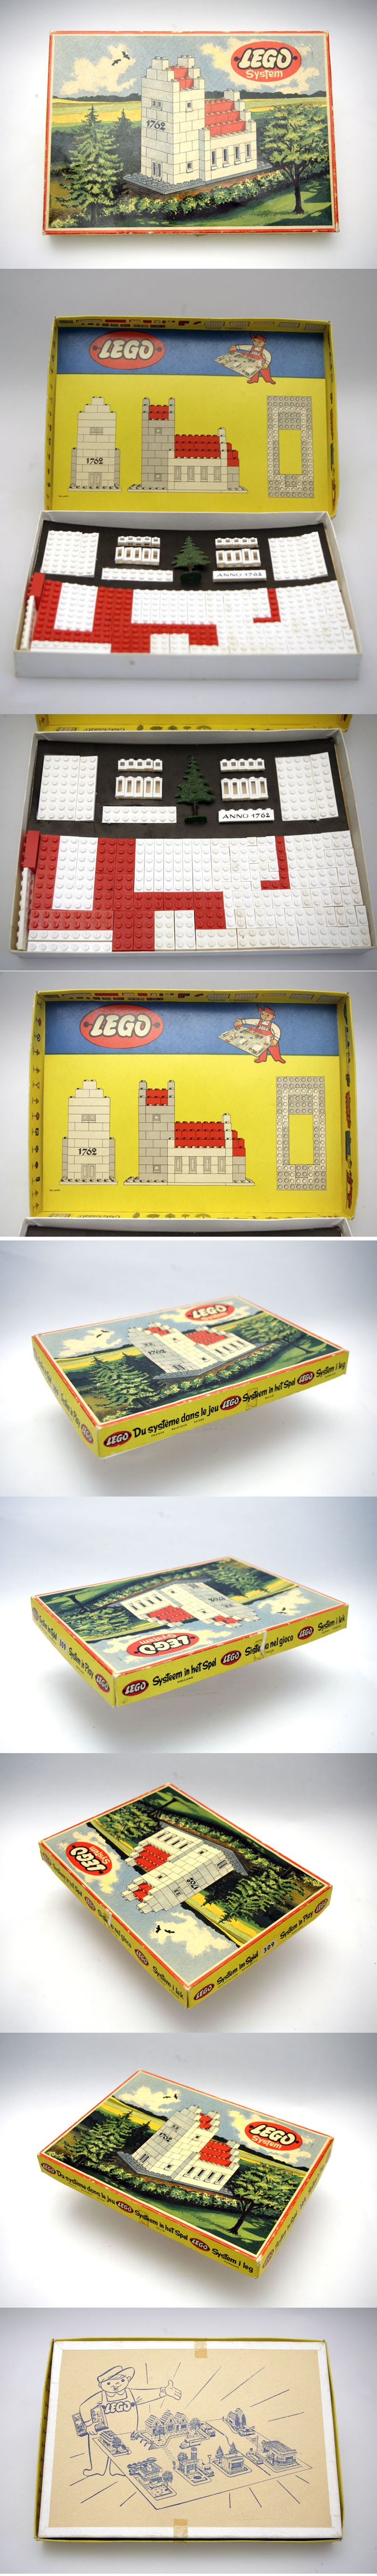 1958 Lego Set 309 Church NOW ONLINE FOR SALE AT EBAY.DE